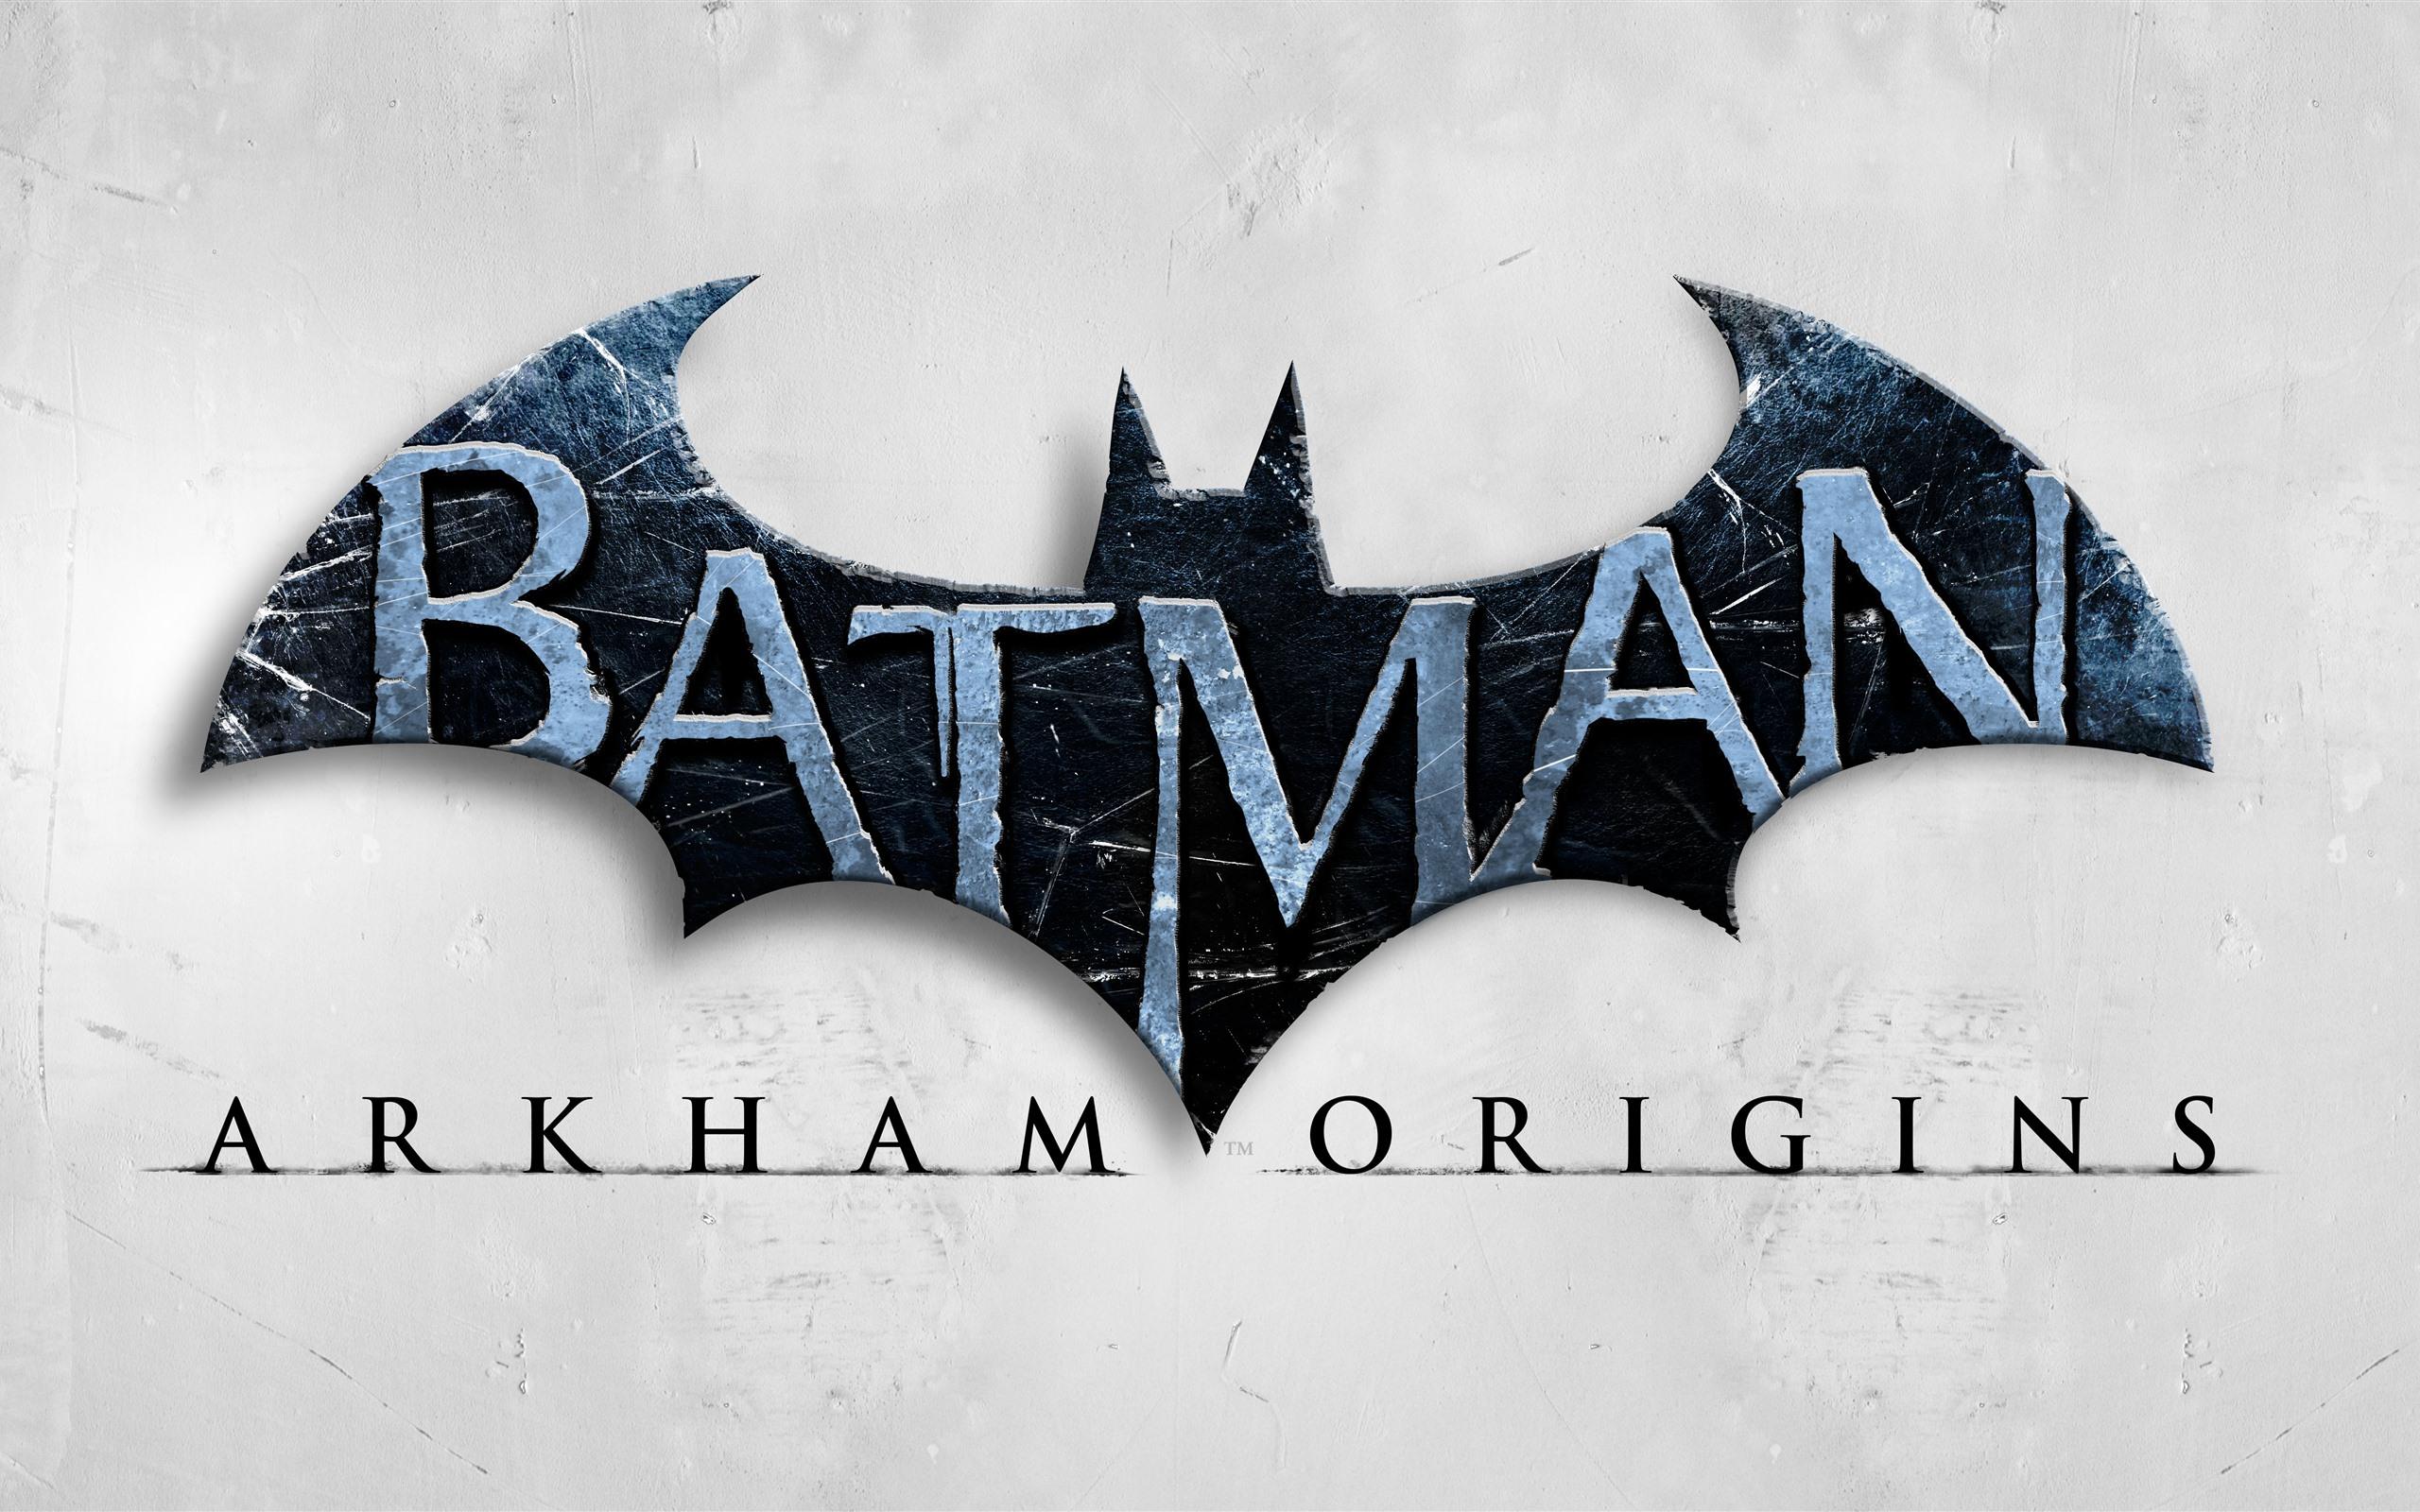 Batman Logo 1242x2688 Iphone 11 Pro Xs Max Wallpaper Background Picture Image